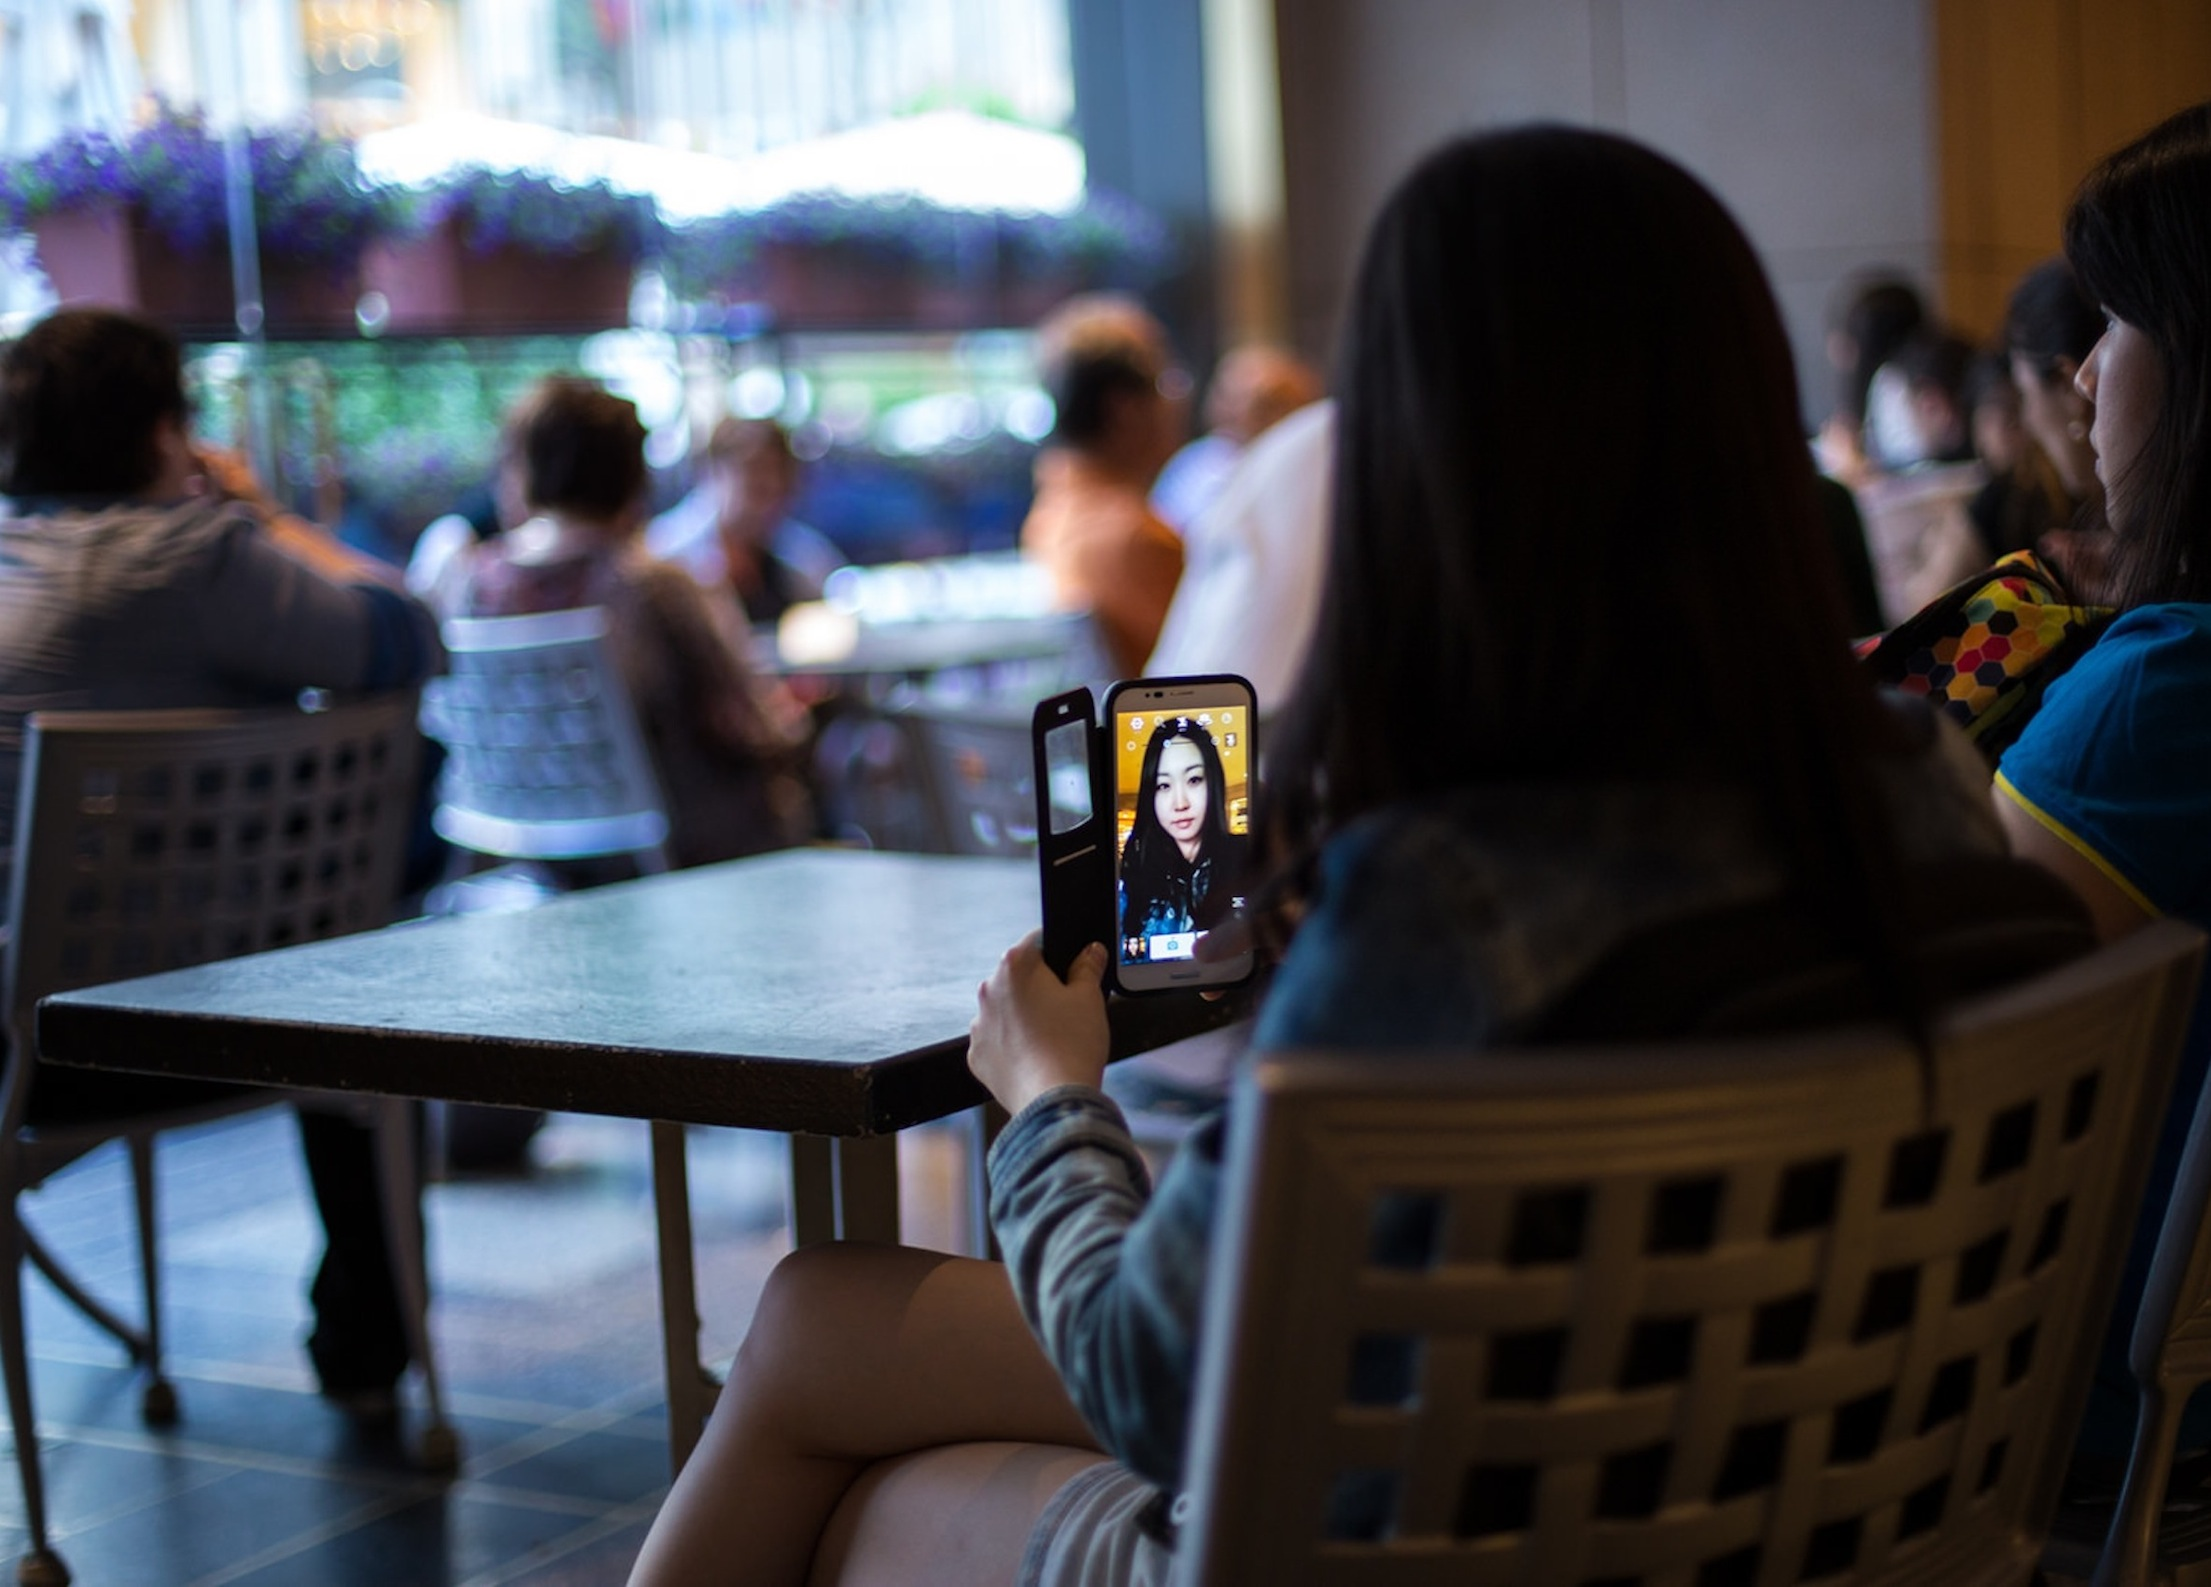 Teléfonos inteligentes… ¿elección inteligente?